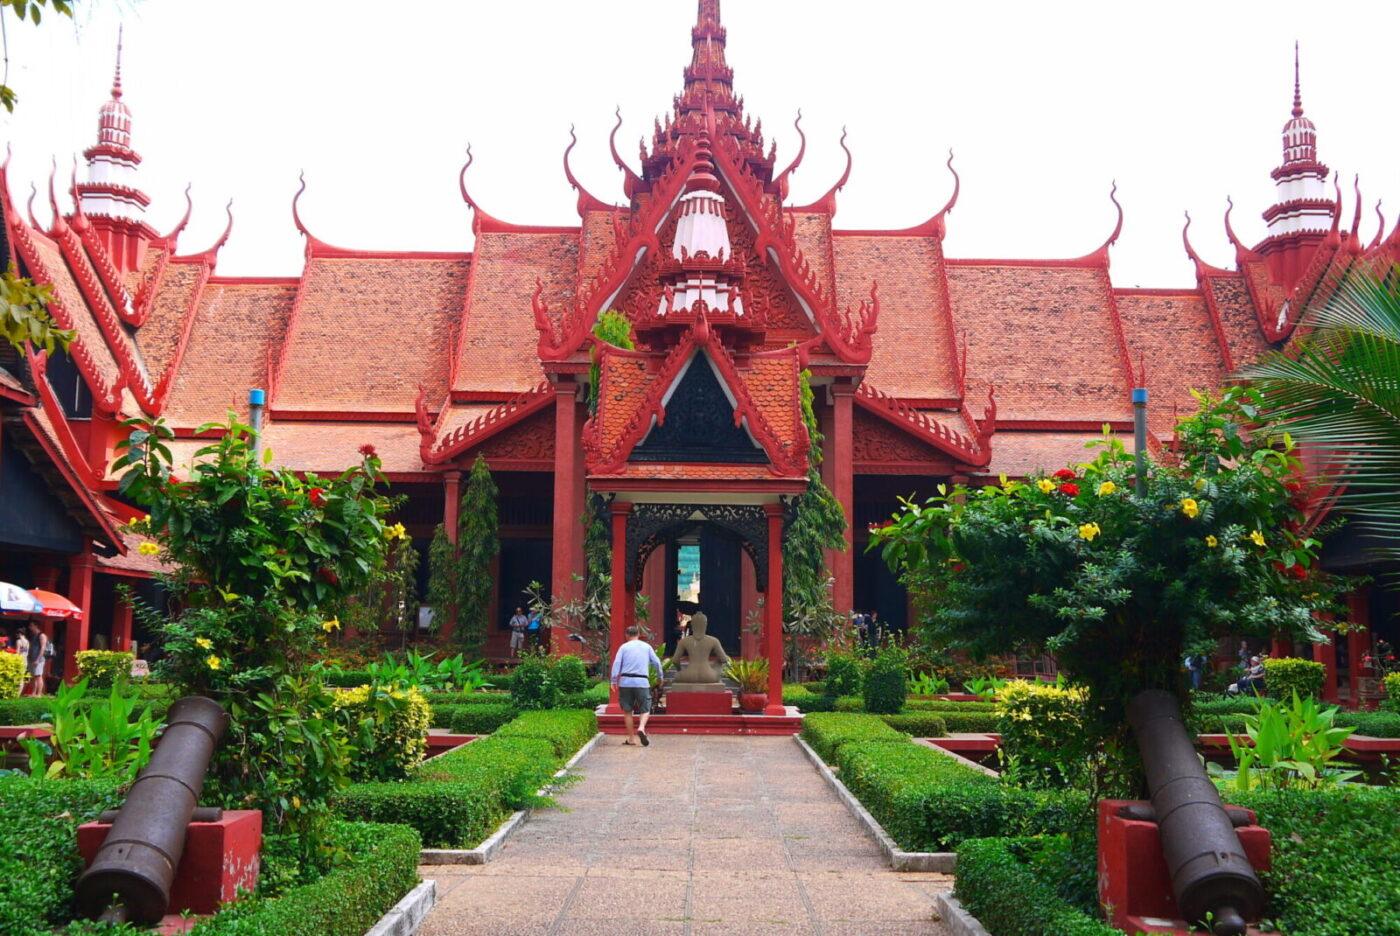 Oplev Royale Palads i Cambodia